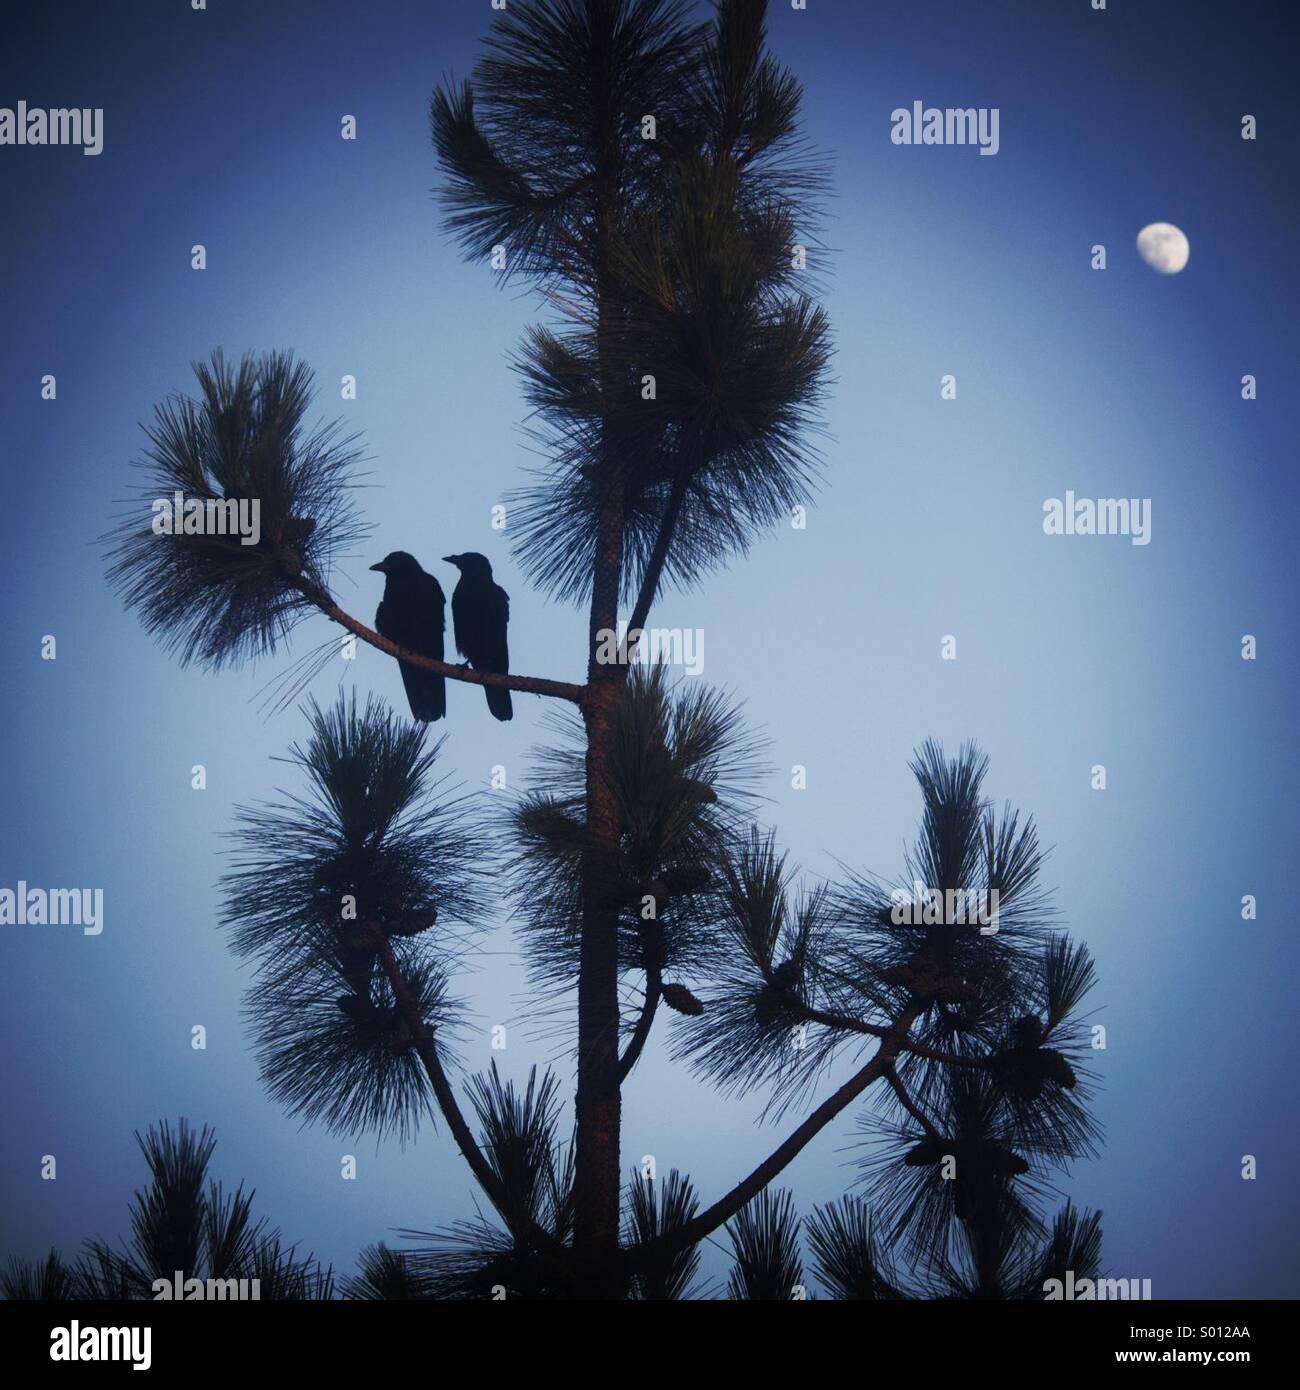 Love birds in a tree. - Stock Image